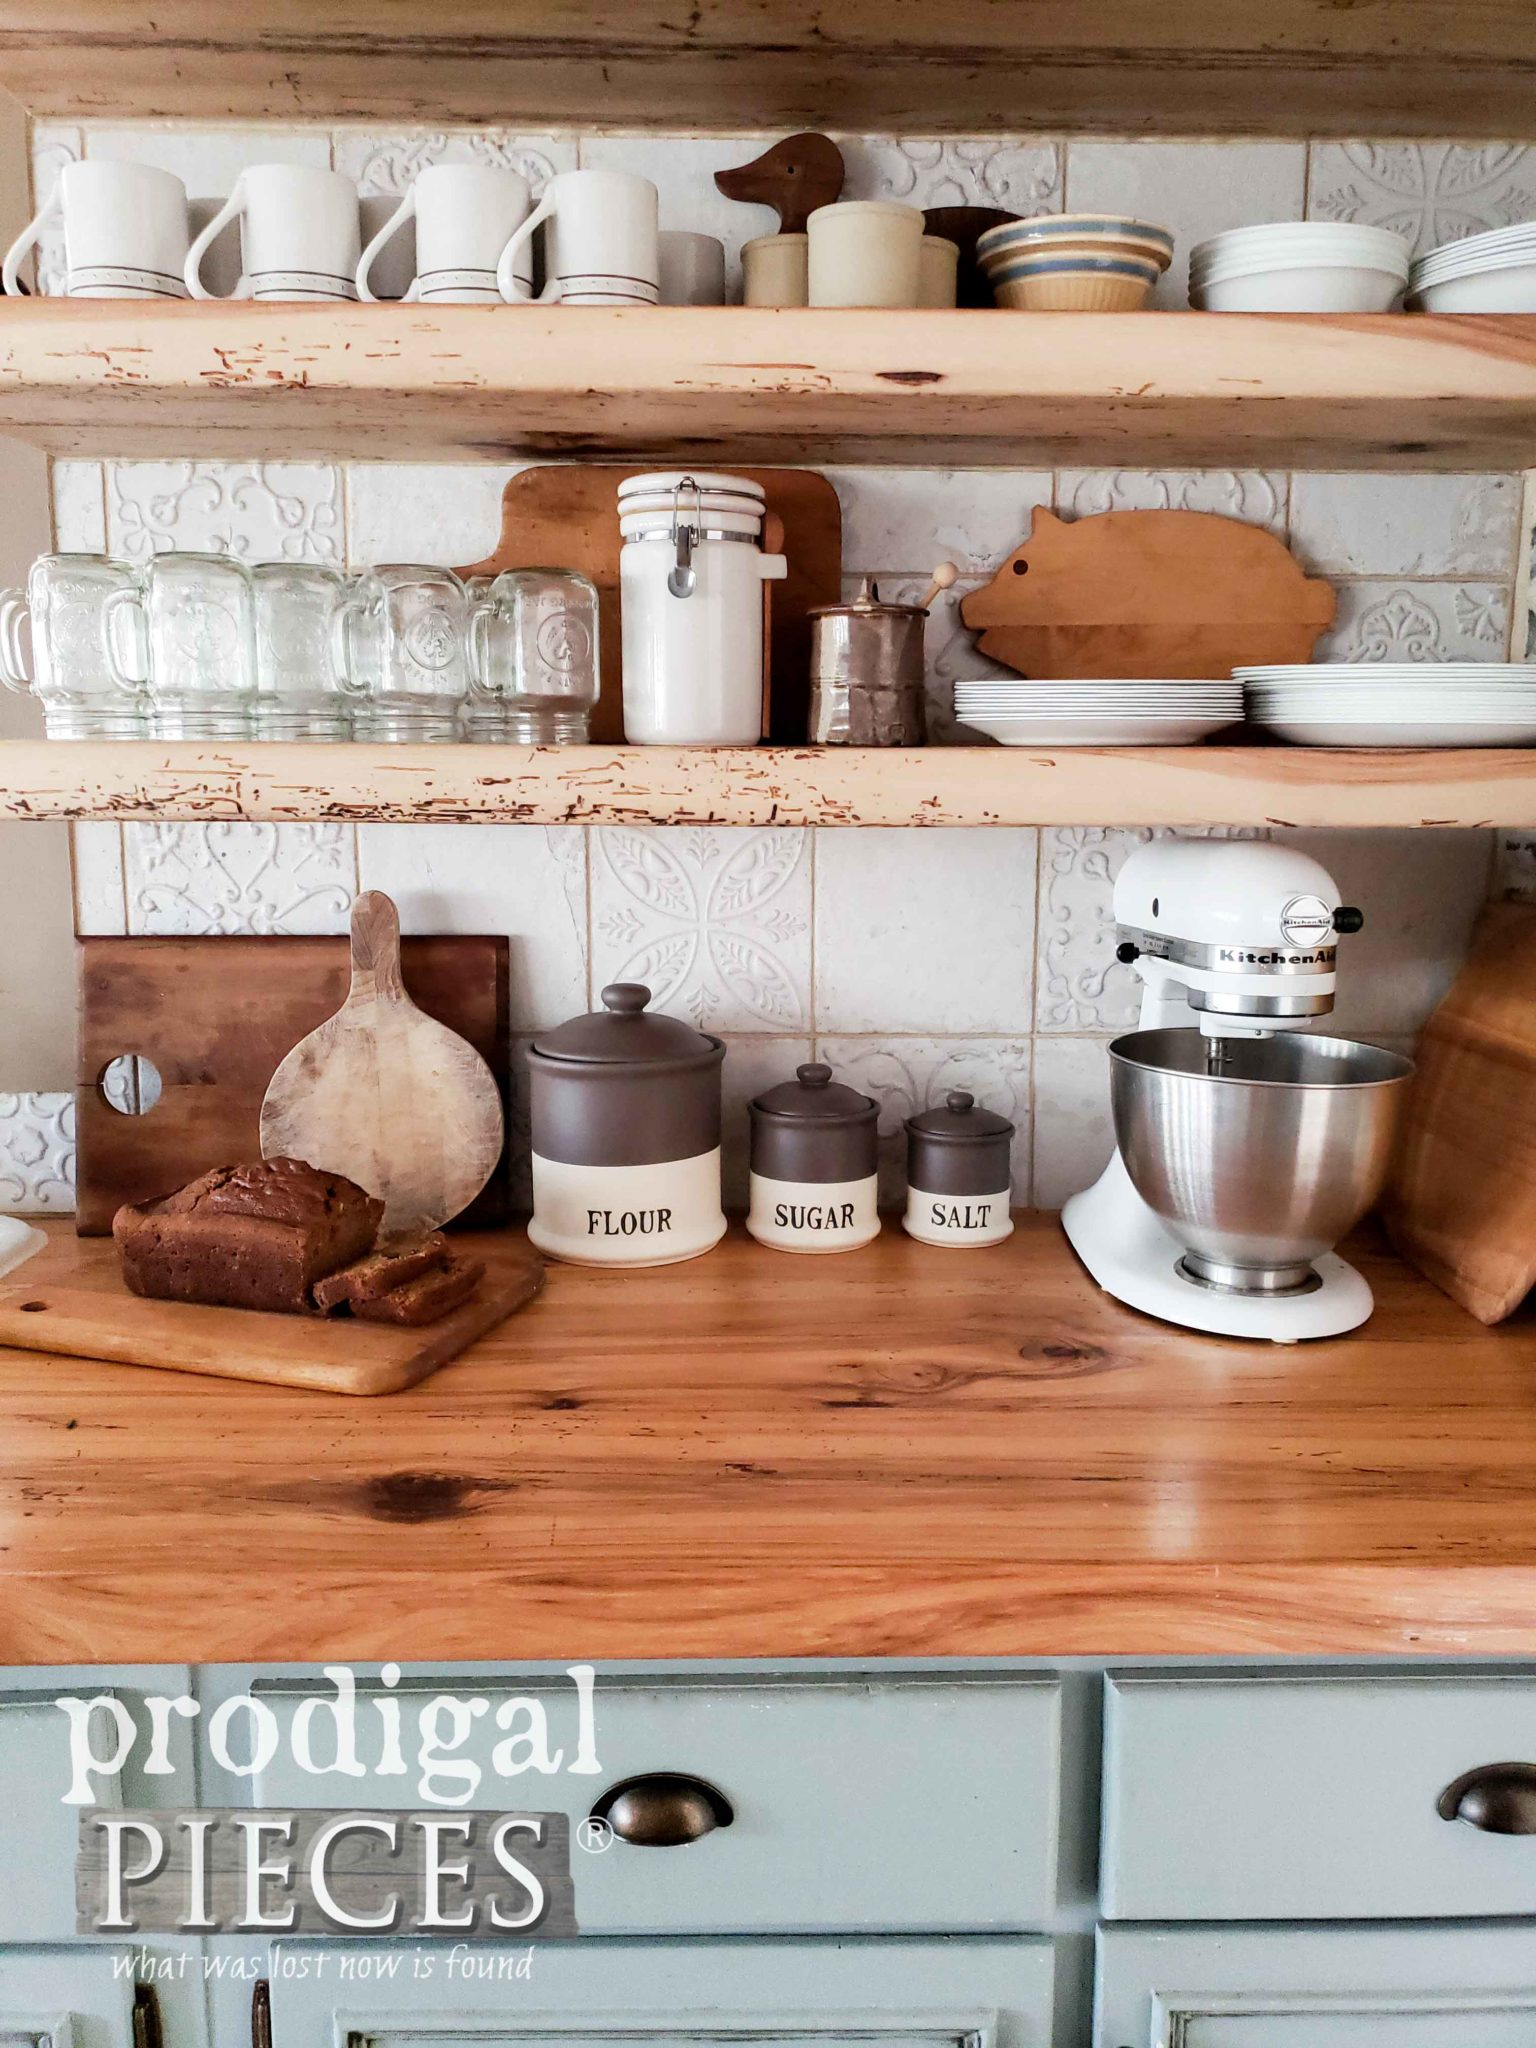 Farmhouse Style Kitchen with DIY decor by Larissa of Prodigal Pieces | prodigalpieces.com